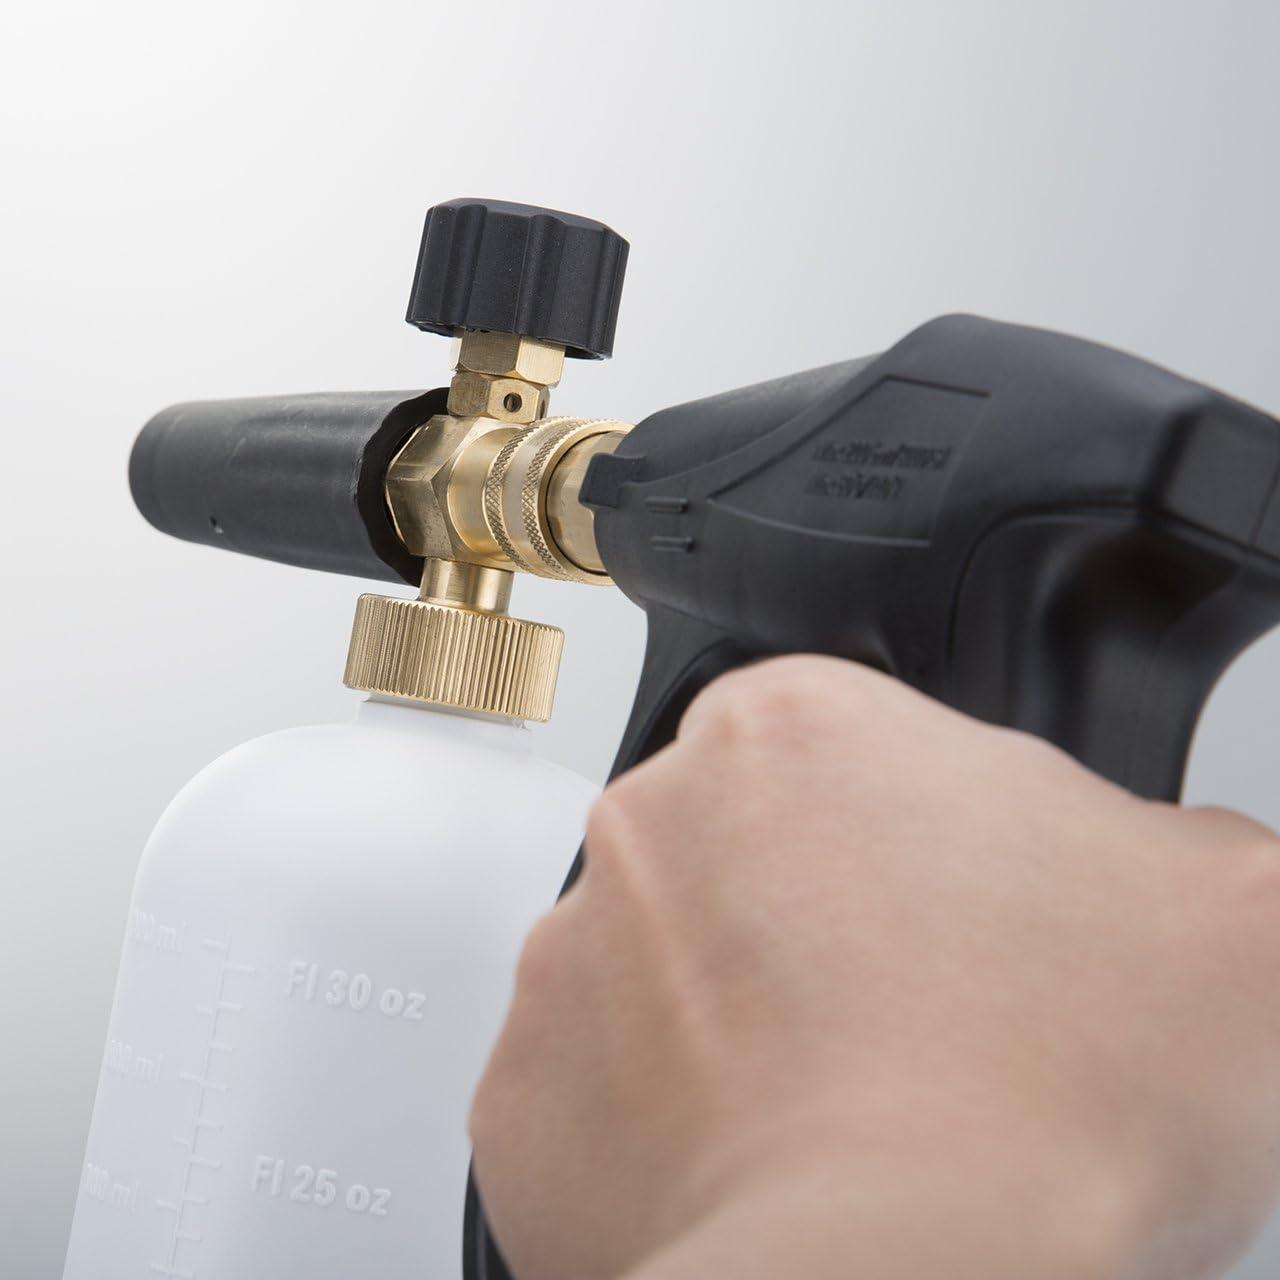 DEDC Car Foam Wash Gun,Car Wash Soap Kit Sprayer 1000-3000PSI High Pressure Washer with 1L Snow Foam Bottle